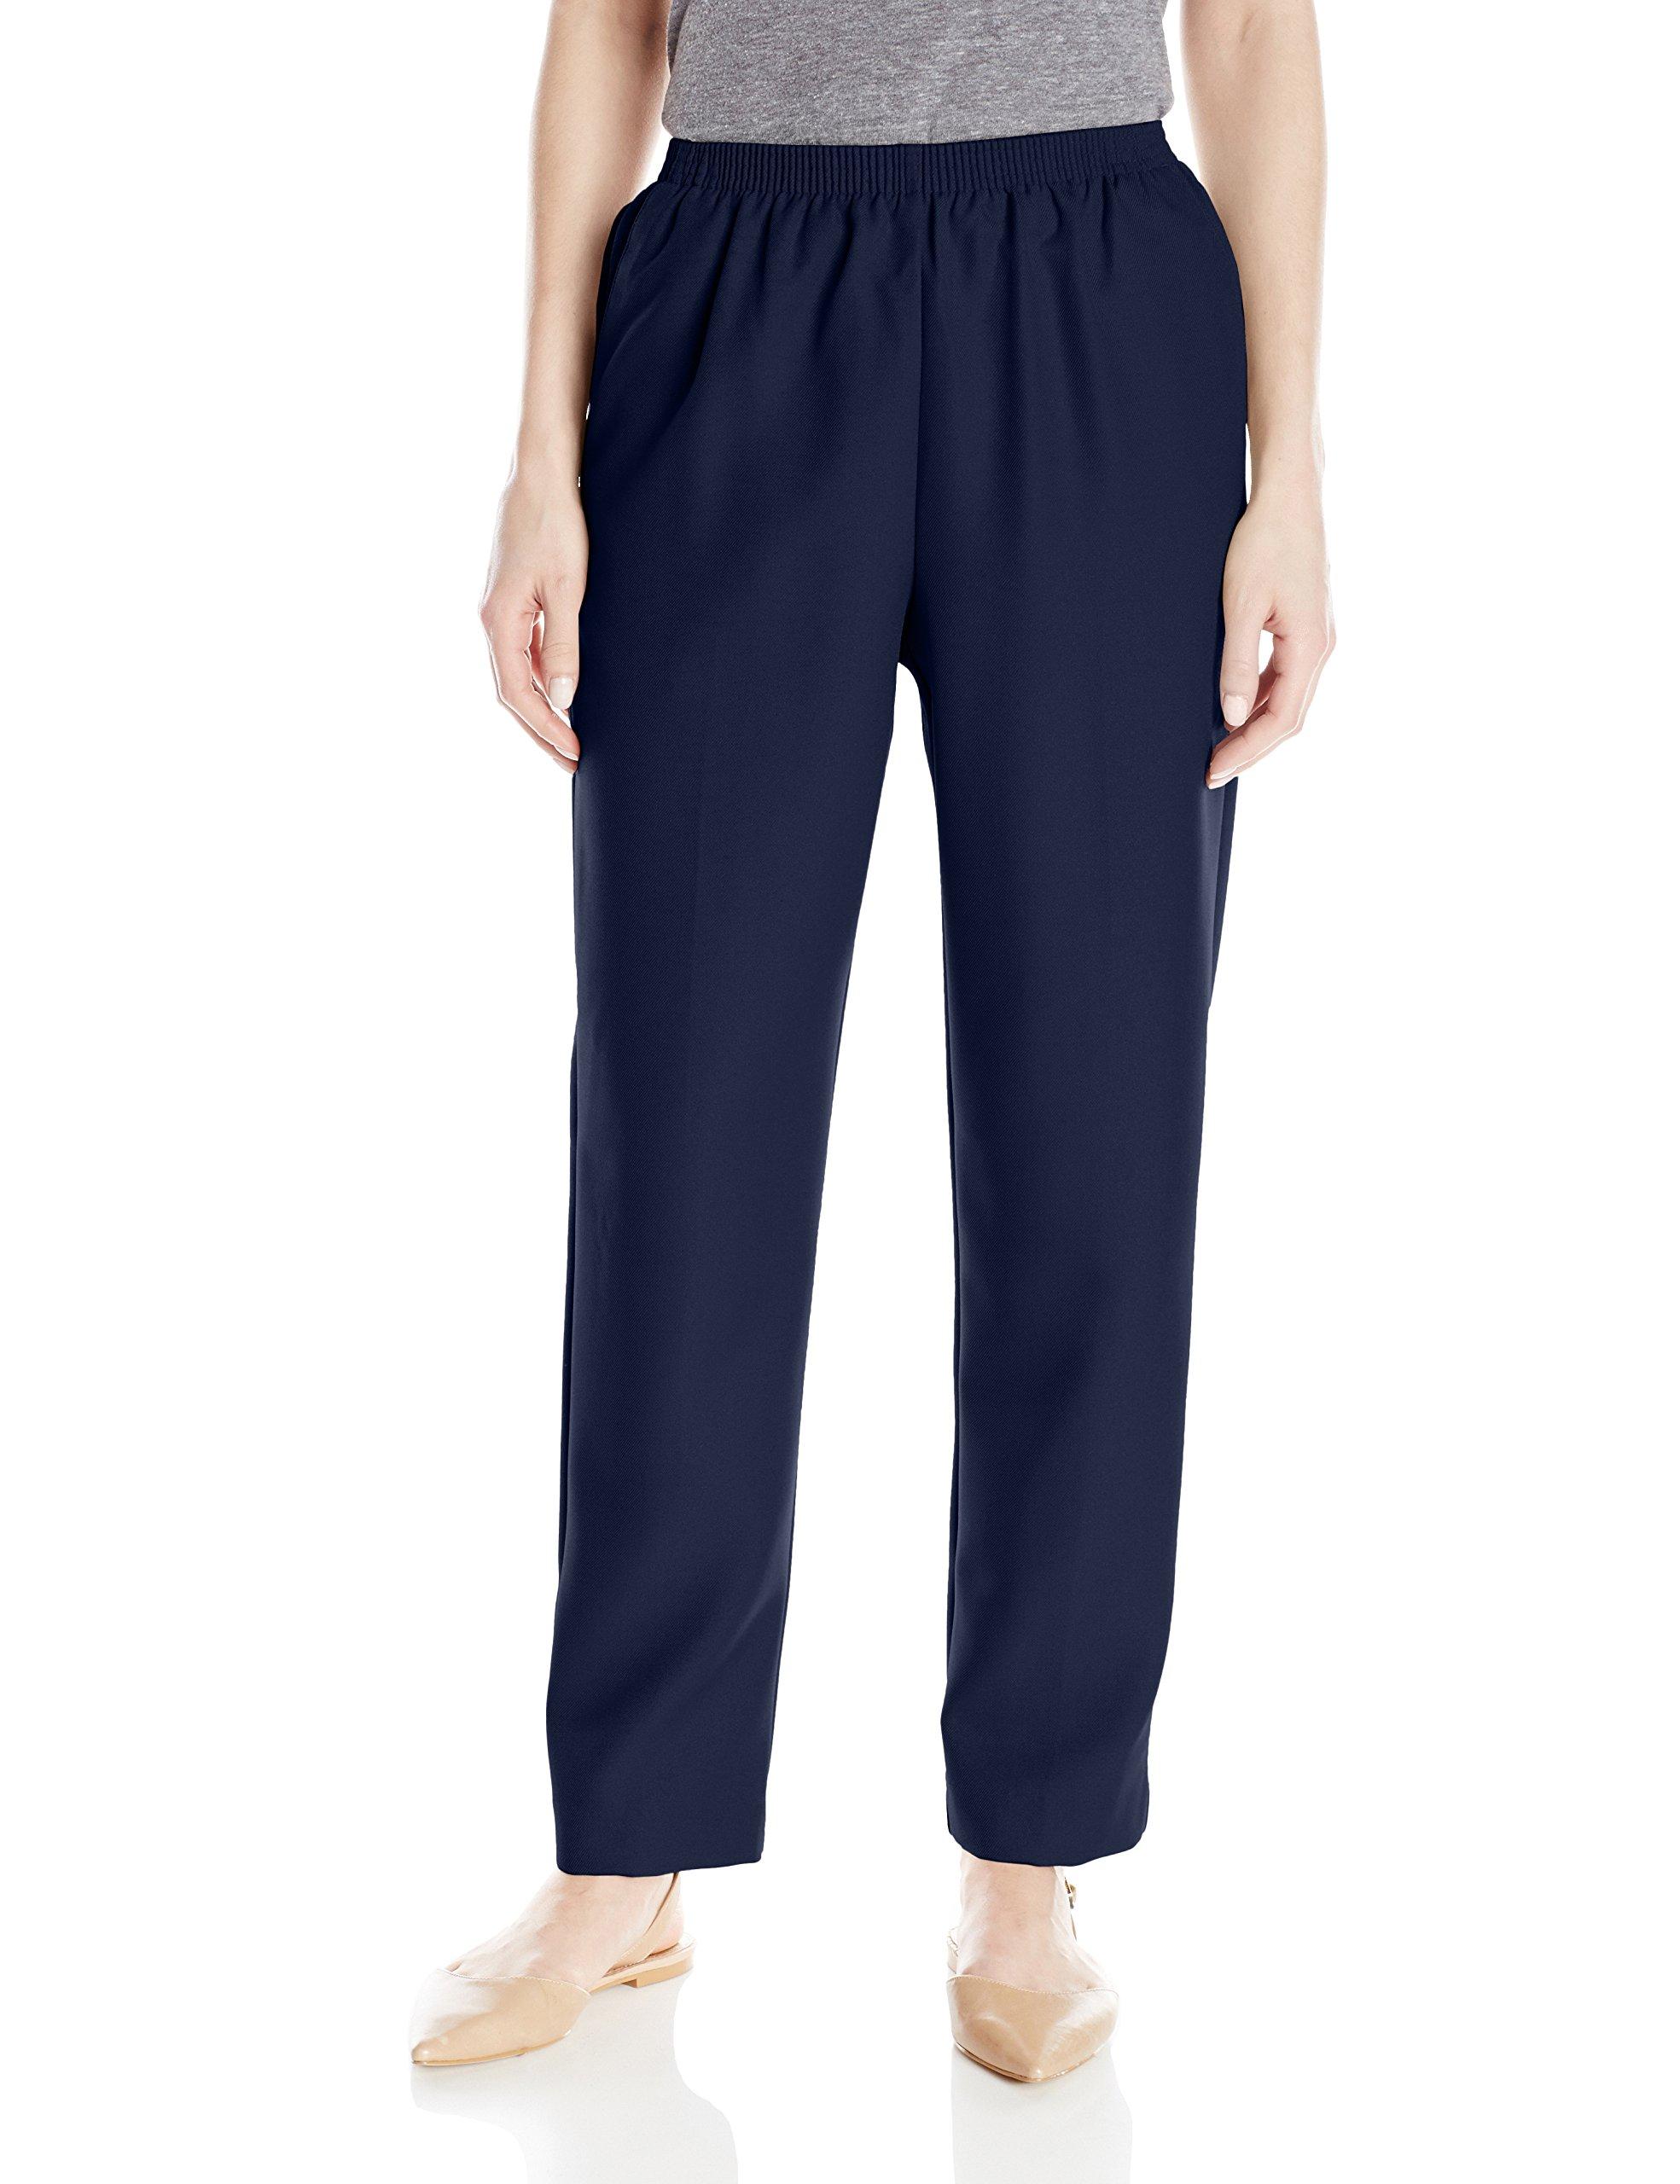 Alfred Dunner Women's Petite Average Pant, Navy, 10P